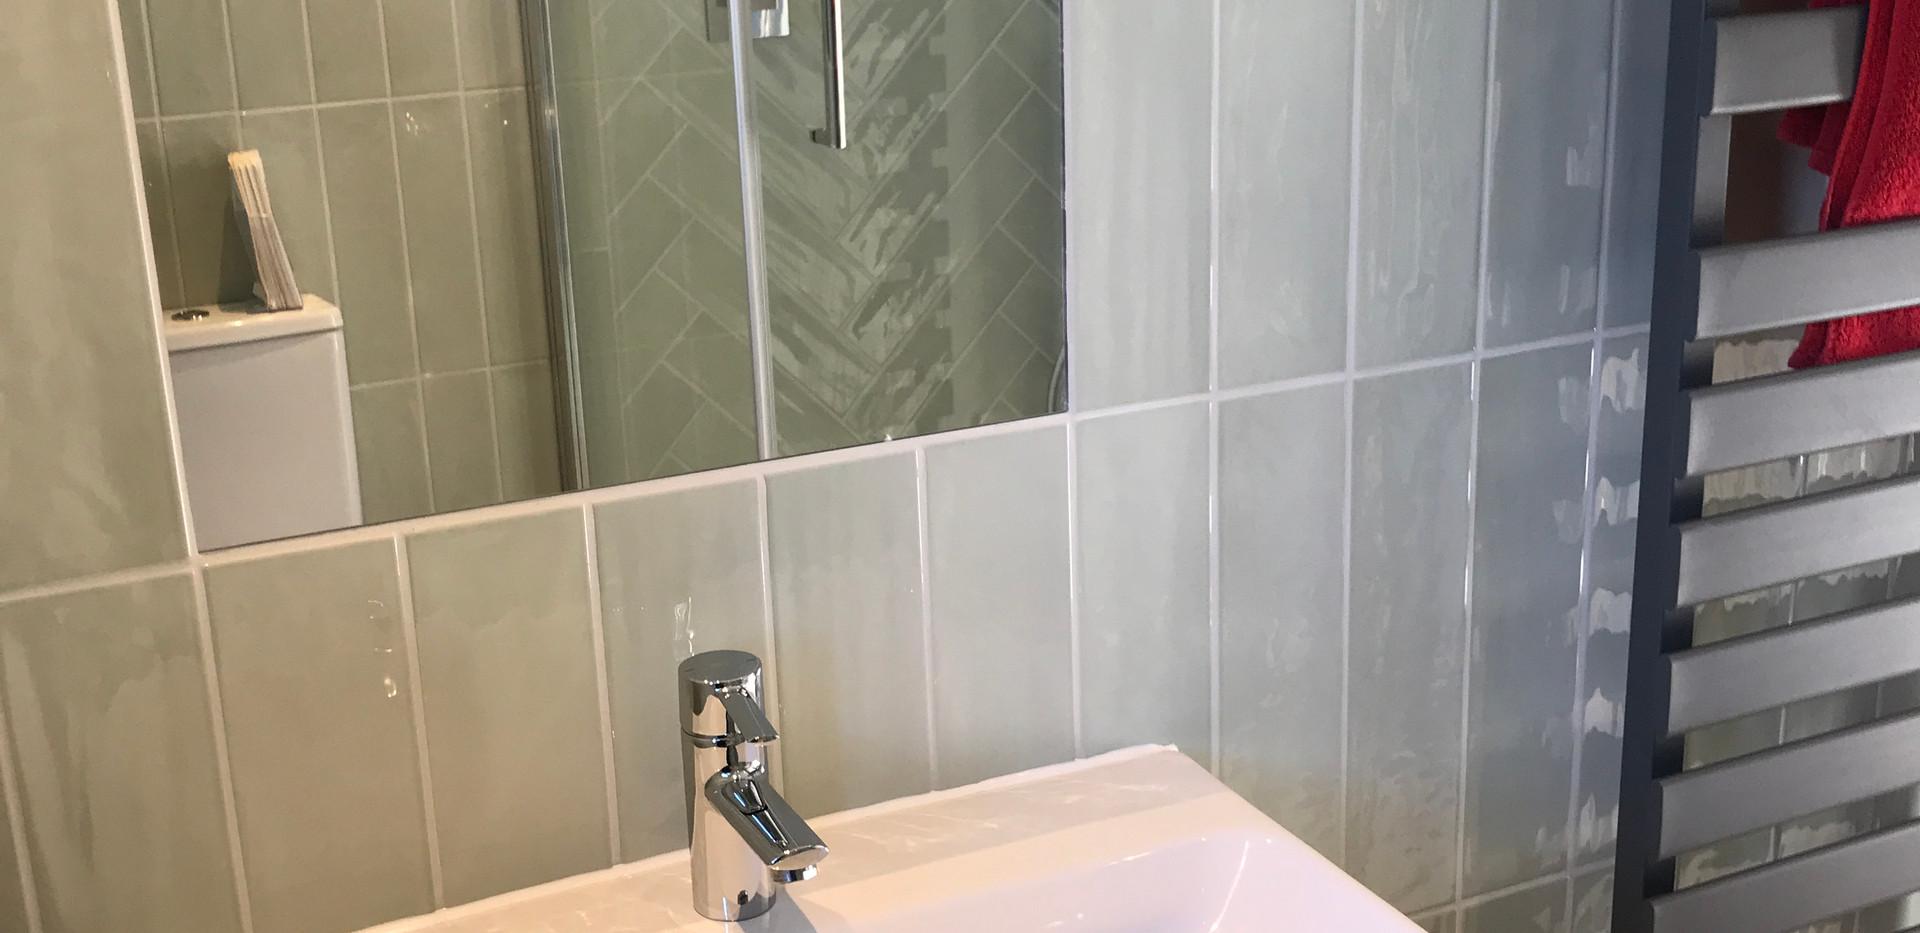 bay master bathroom sink.JPG